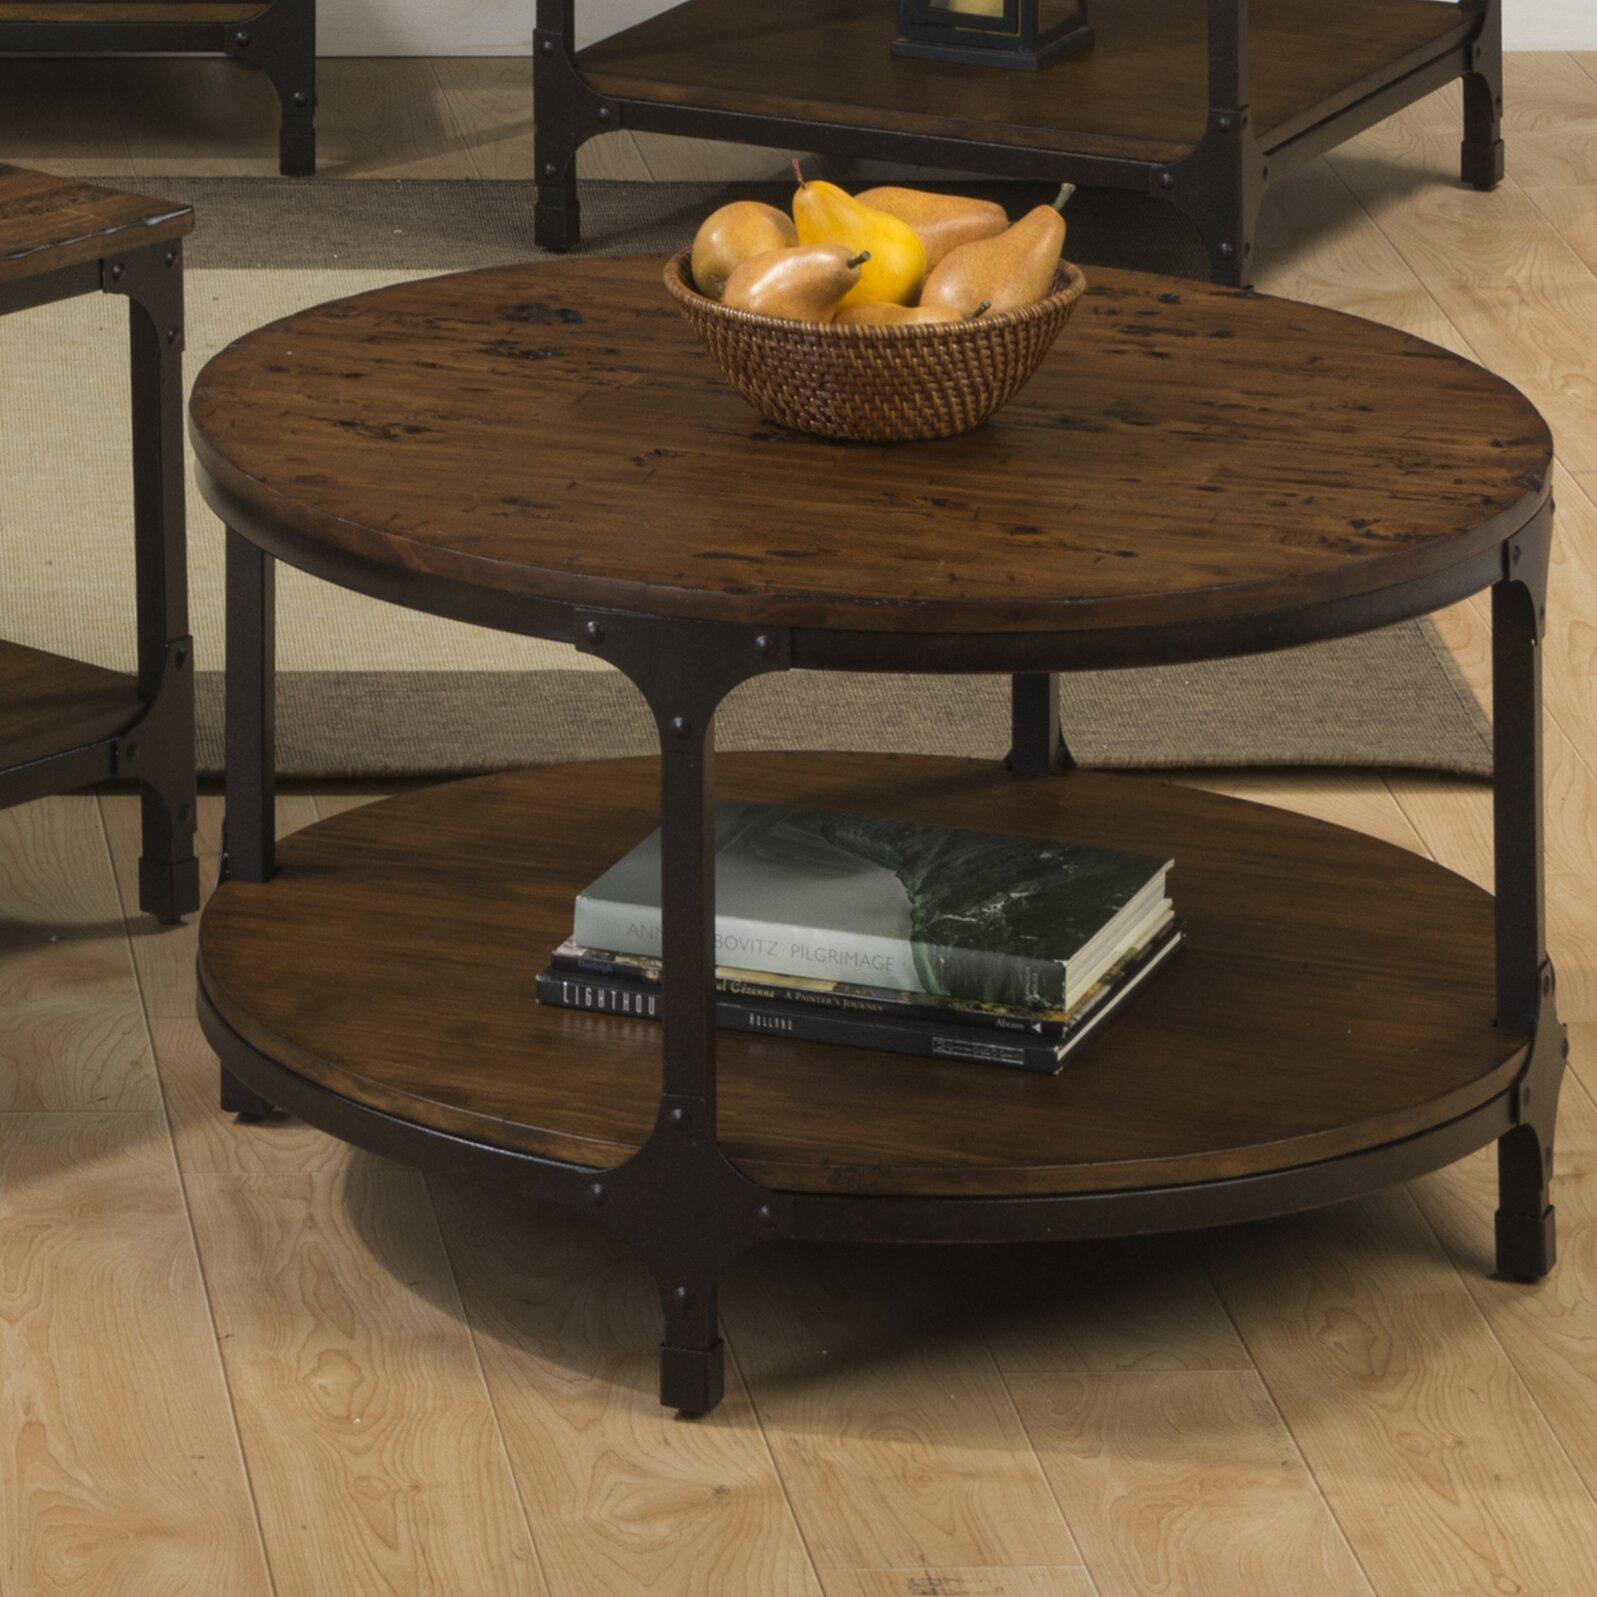 Hebbville Coffee Table Reviews: Jofran Urban Nature Coffee Table & Reviews